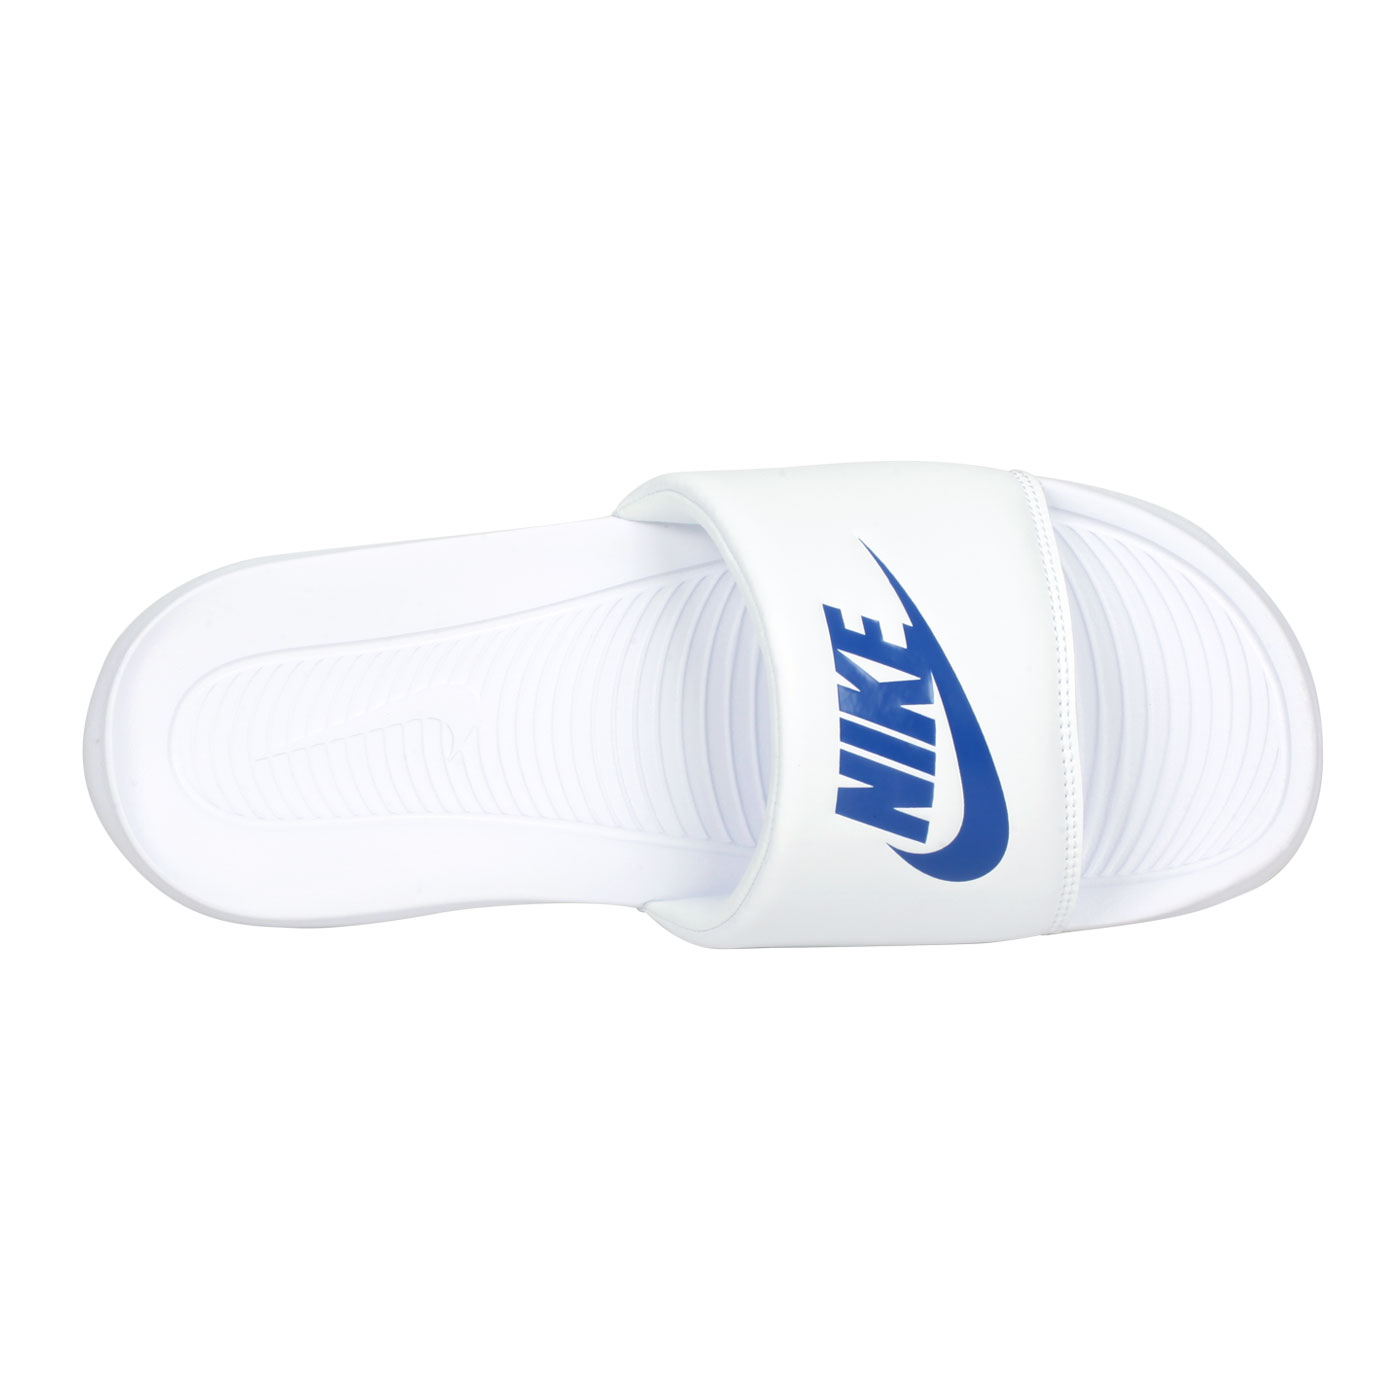 NIKE 運動拖鞋  @ VICTORI ONE SLIDE@CN9675102 - 白藍